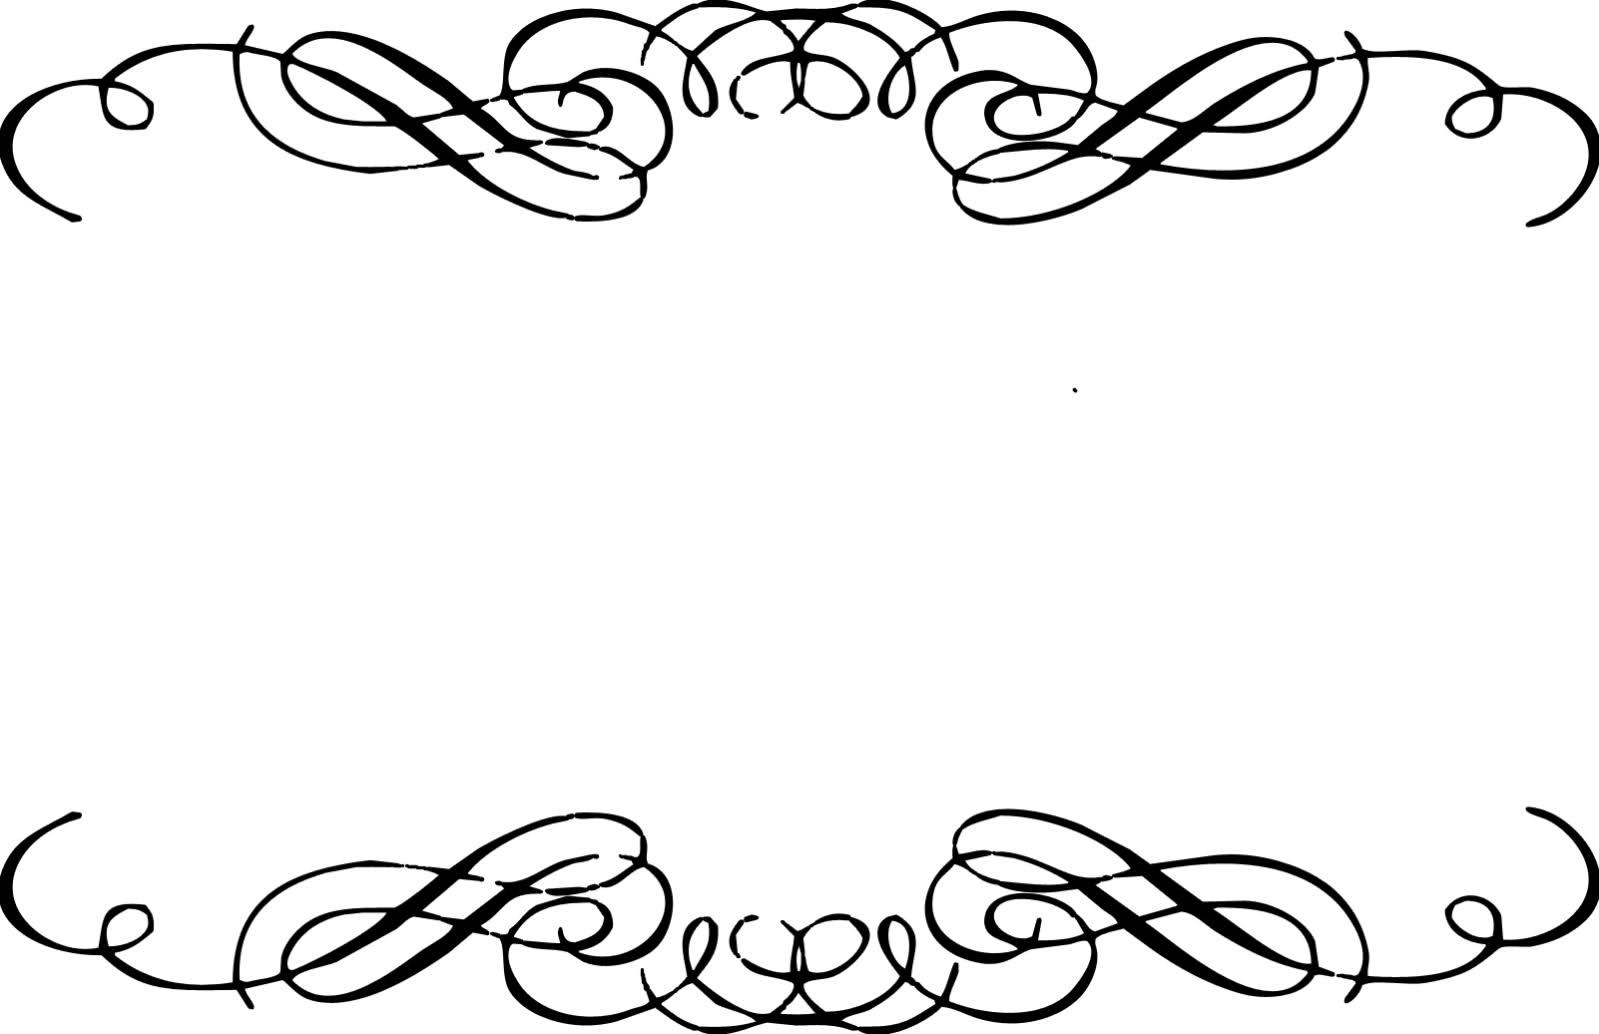 Border clipart fancy. Free swirl download clip